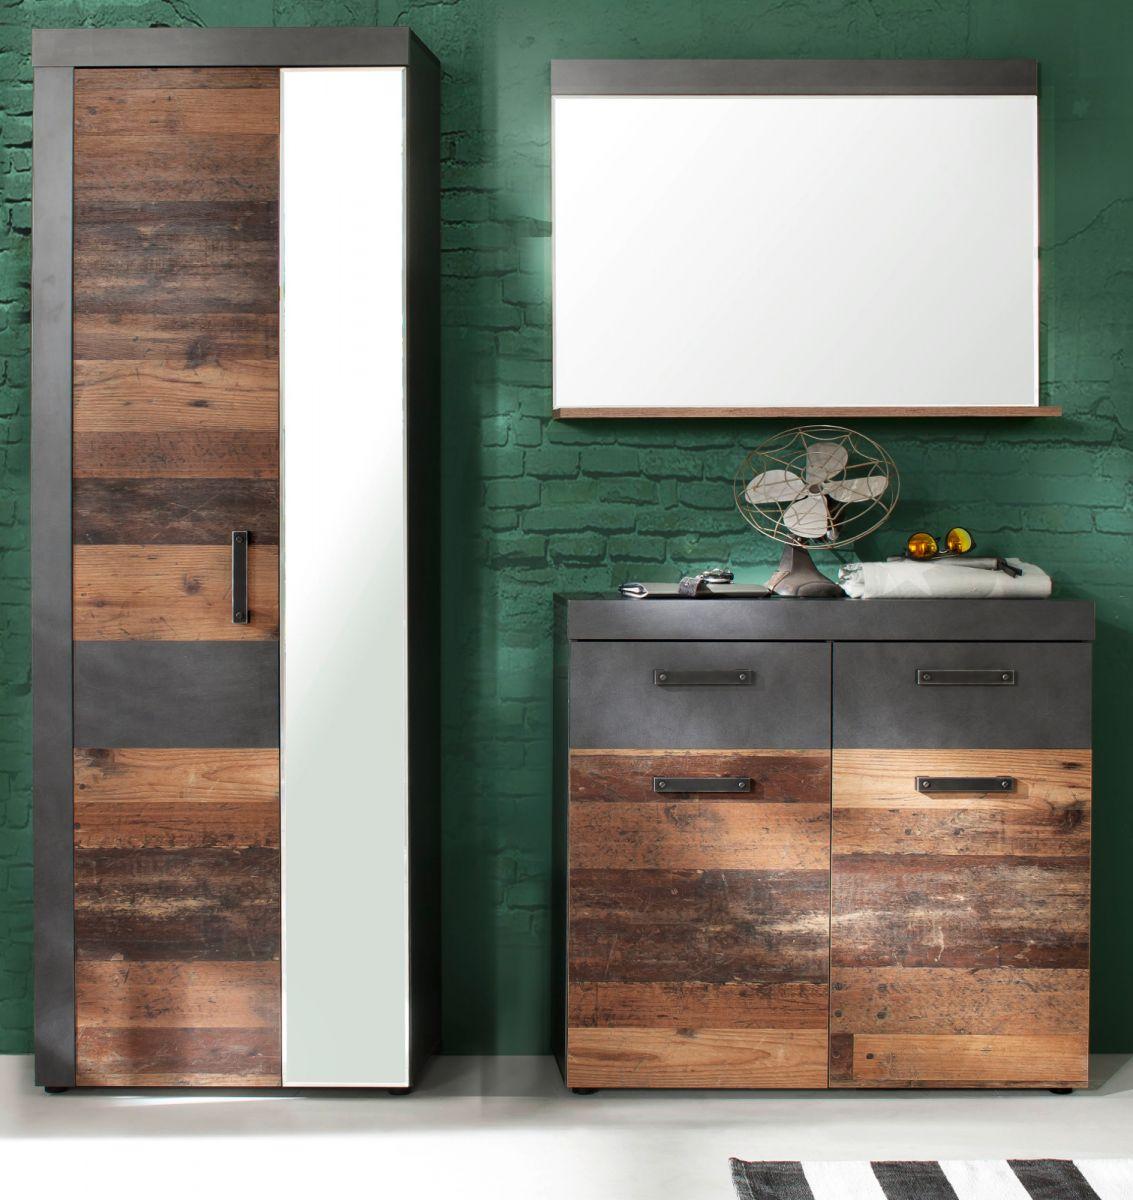 Garderobenset Indy 3-teilig in Used Wood und Matera grau 170 cm